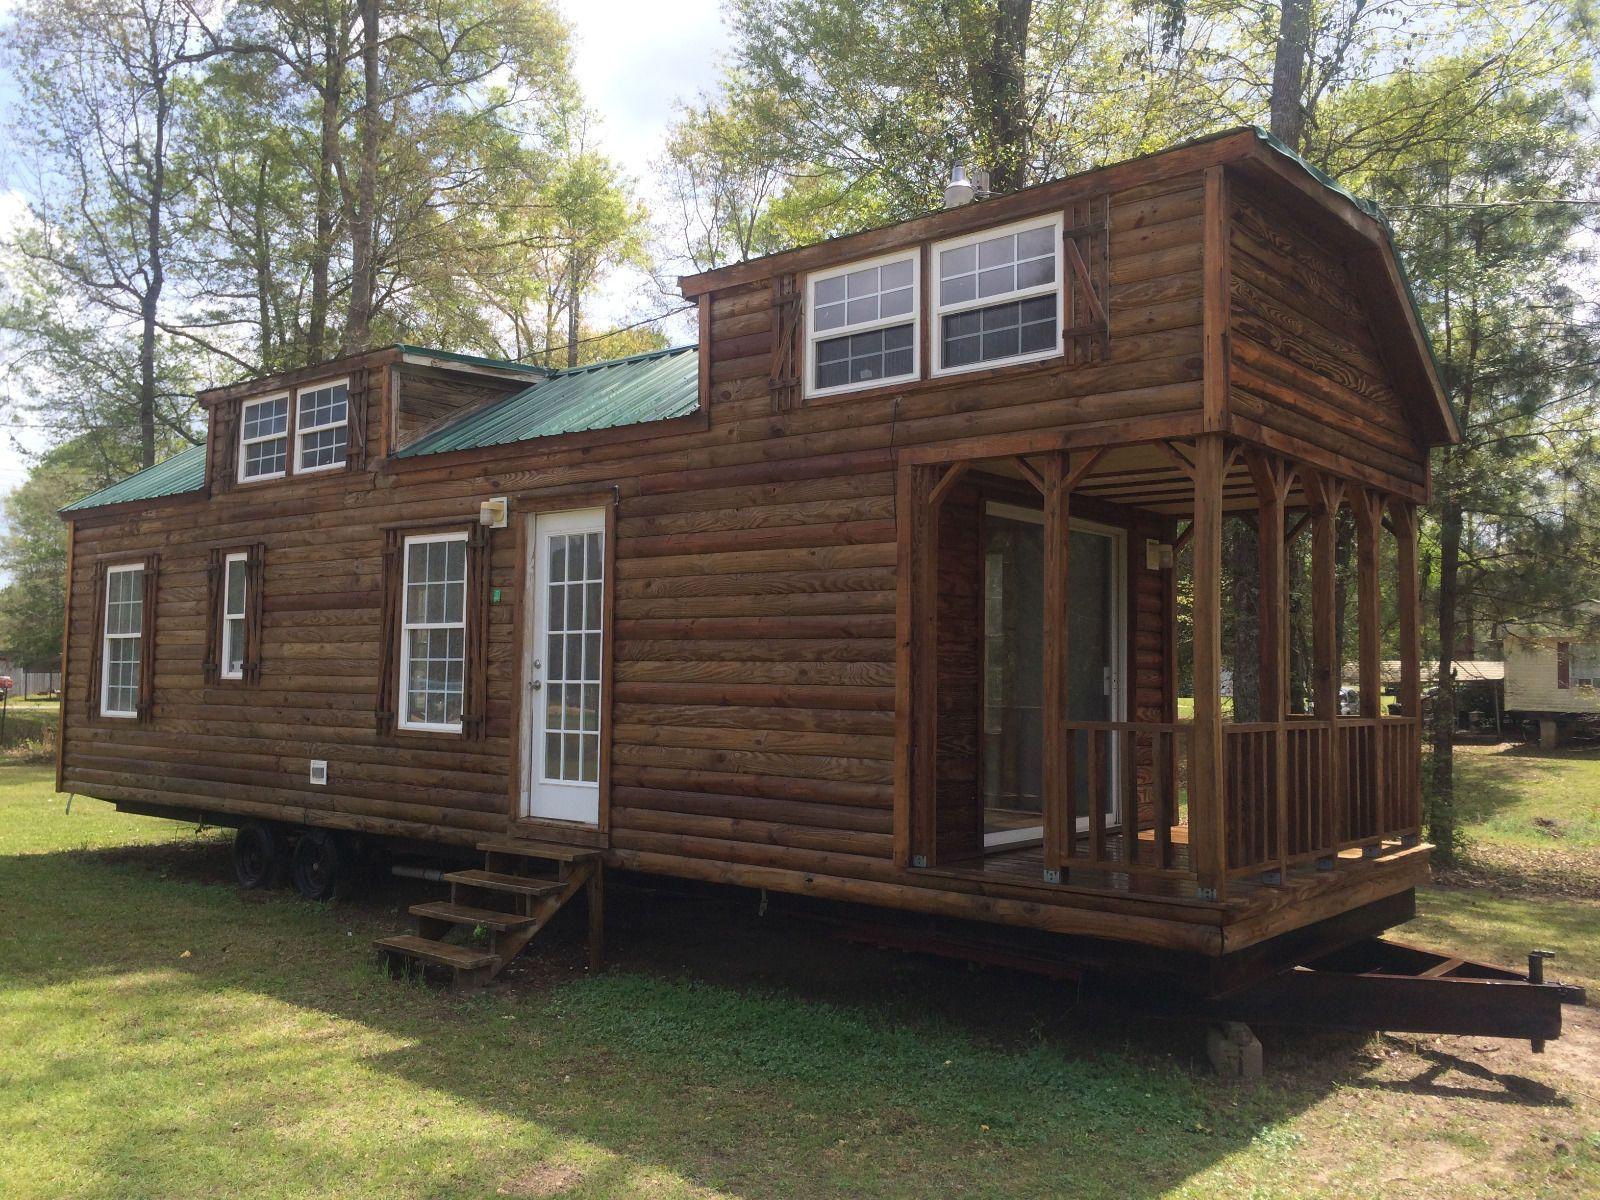 10x38 Tiny House Shell Park Model Rv Trailer Log Cabin Tiny House Trailer Tiny House Exterior House